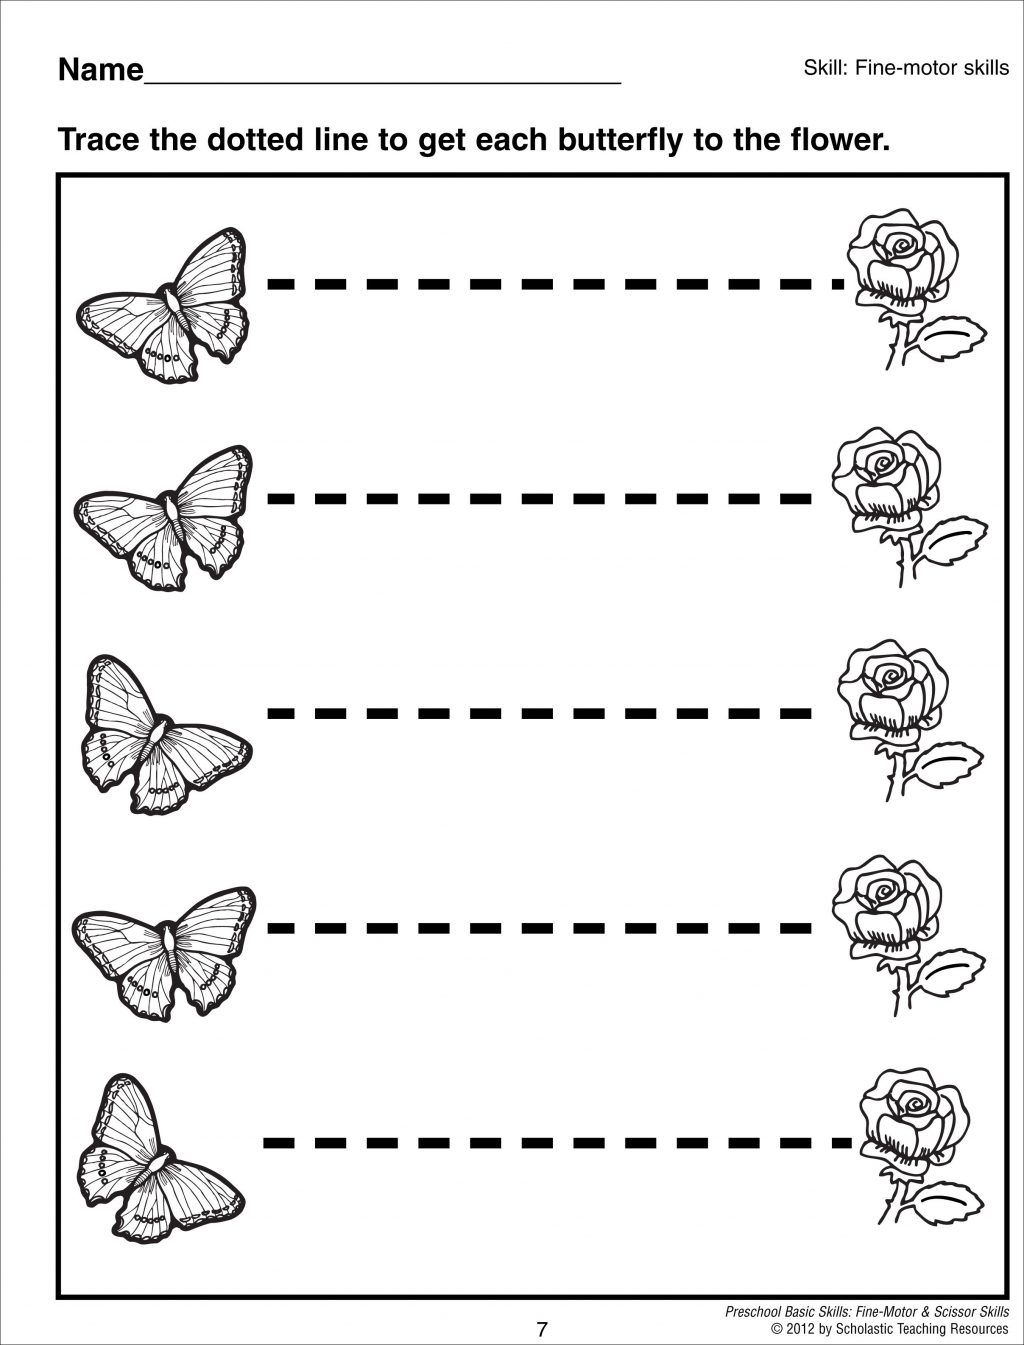 Worksheet Ideas Tracing Lines Worksheets For Preschool Prewriting Activities Preschool Tracing Worksheets Preschool Line Tracing Worksheets [ 1345 x 1024 Pixel ]